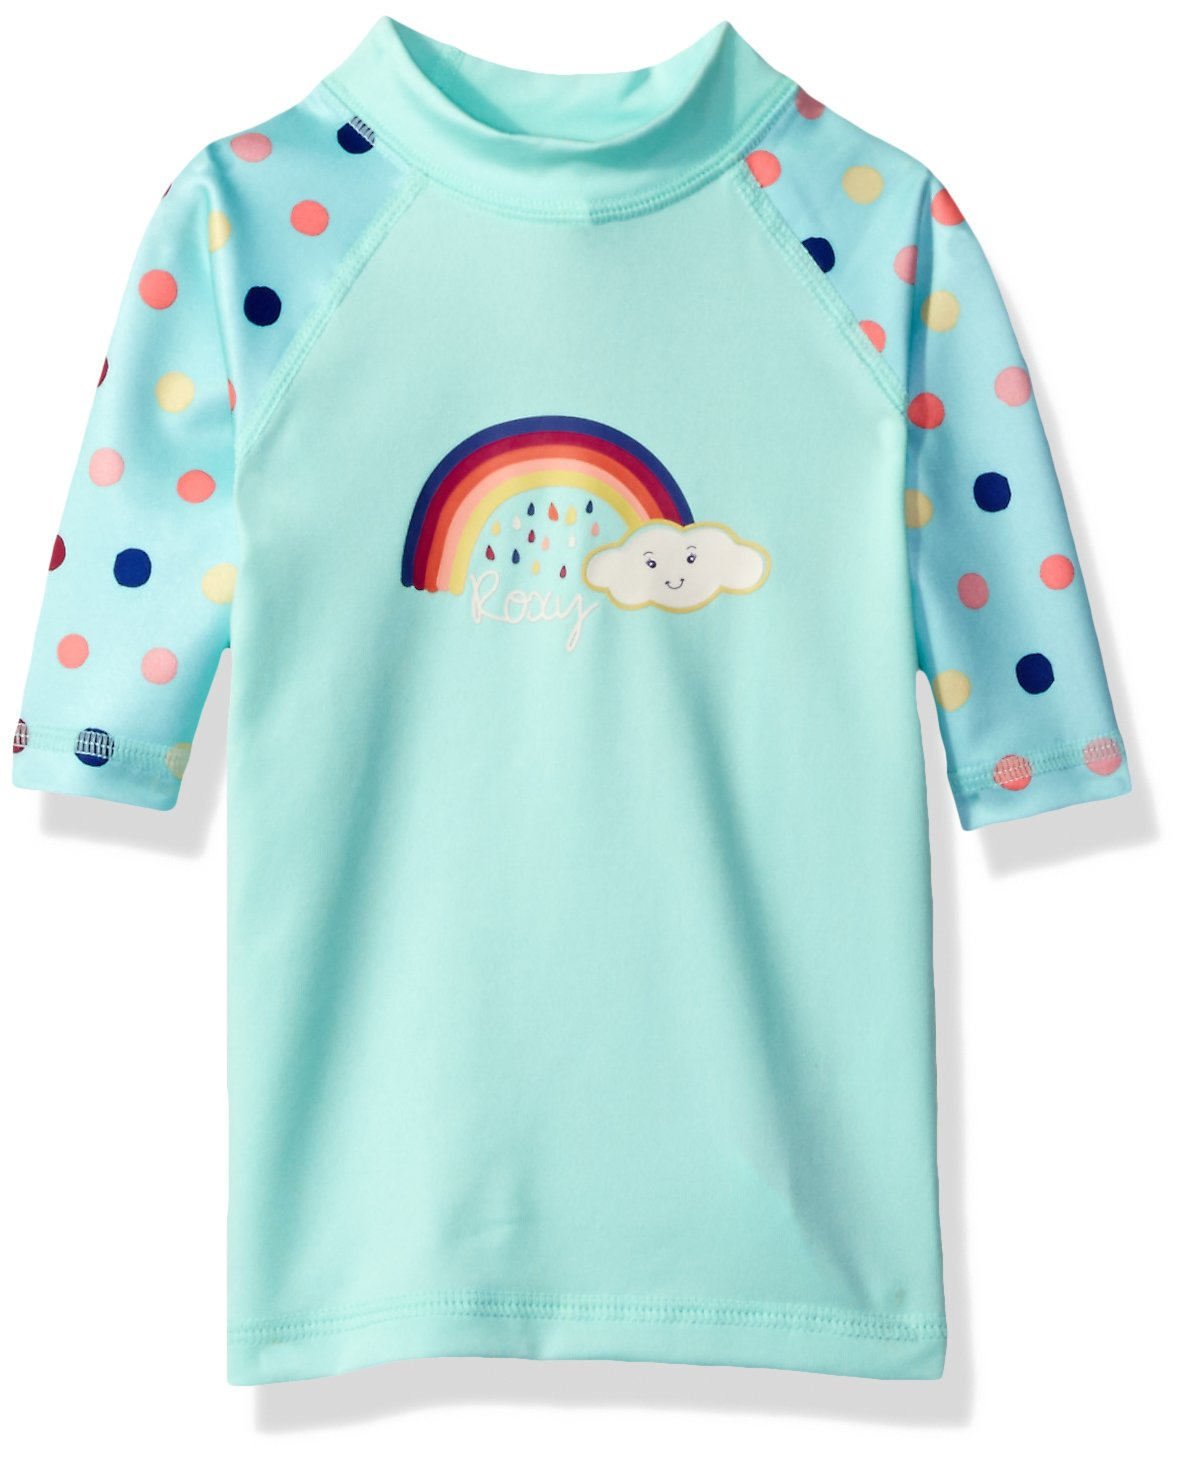 Roxy Toddler Girls' Sweet Tooth Kids Short Sleeve Rashguard, Beach Glass, 2